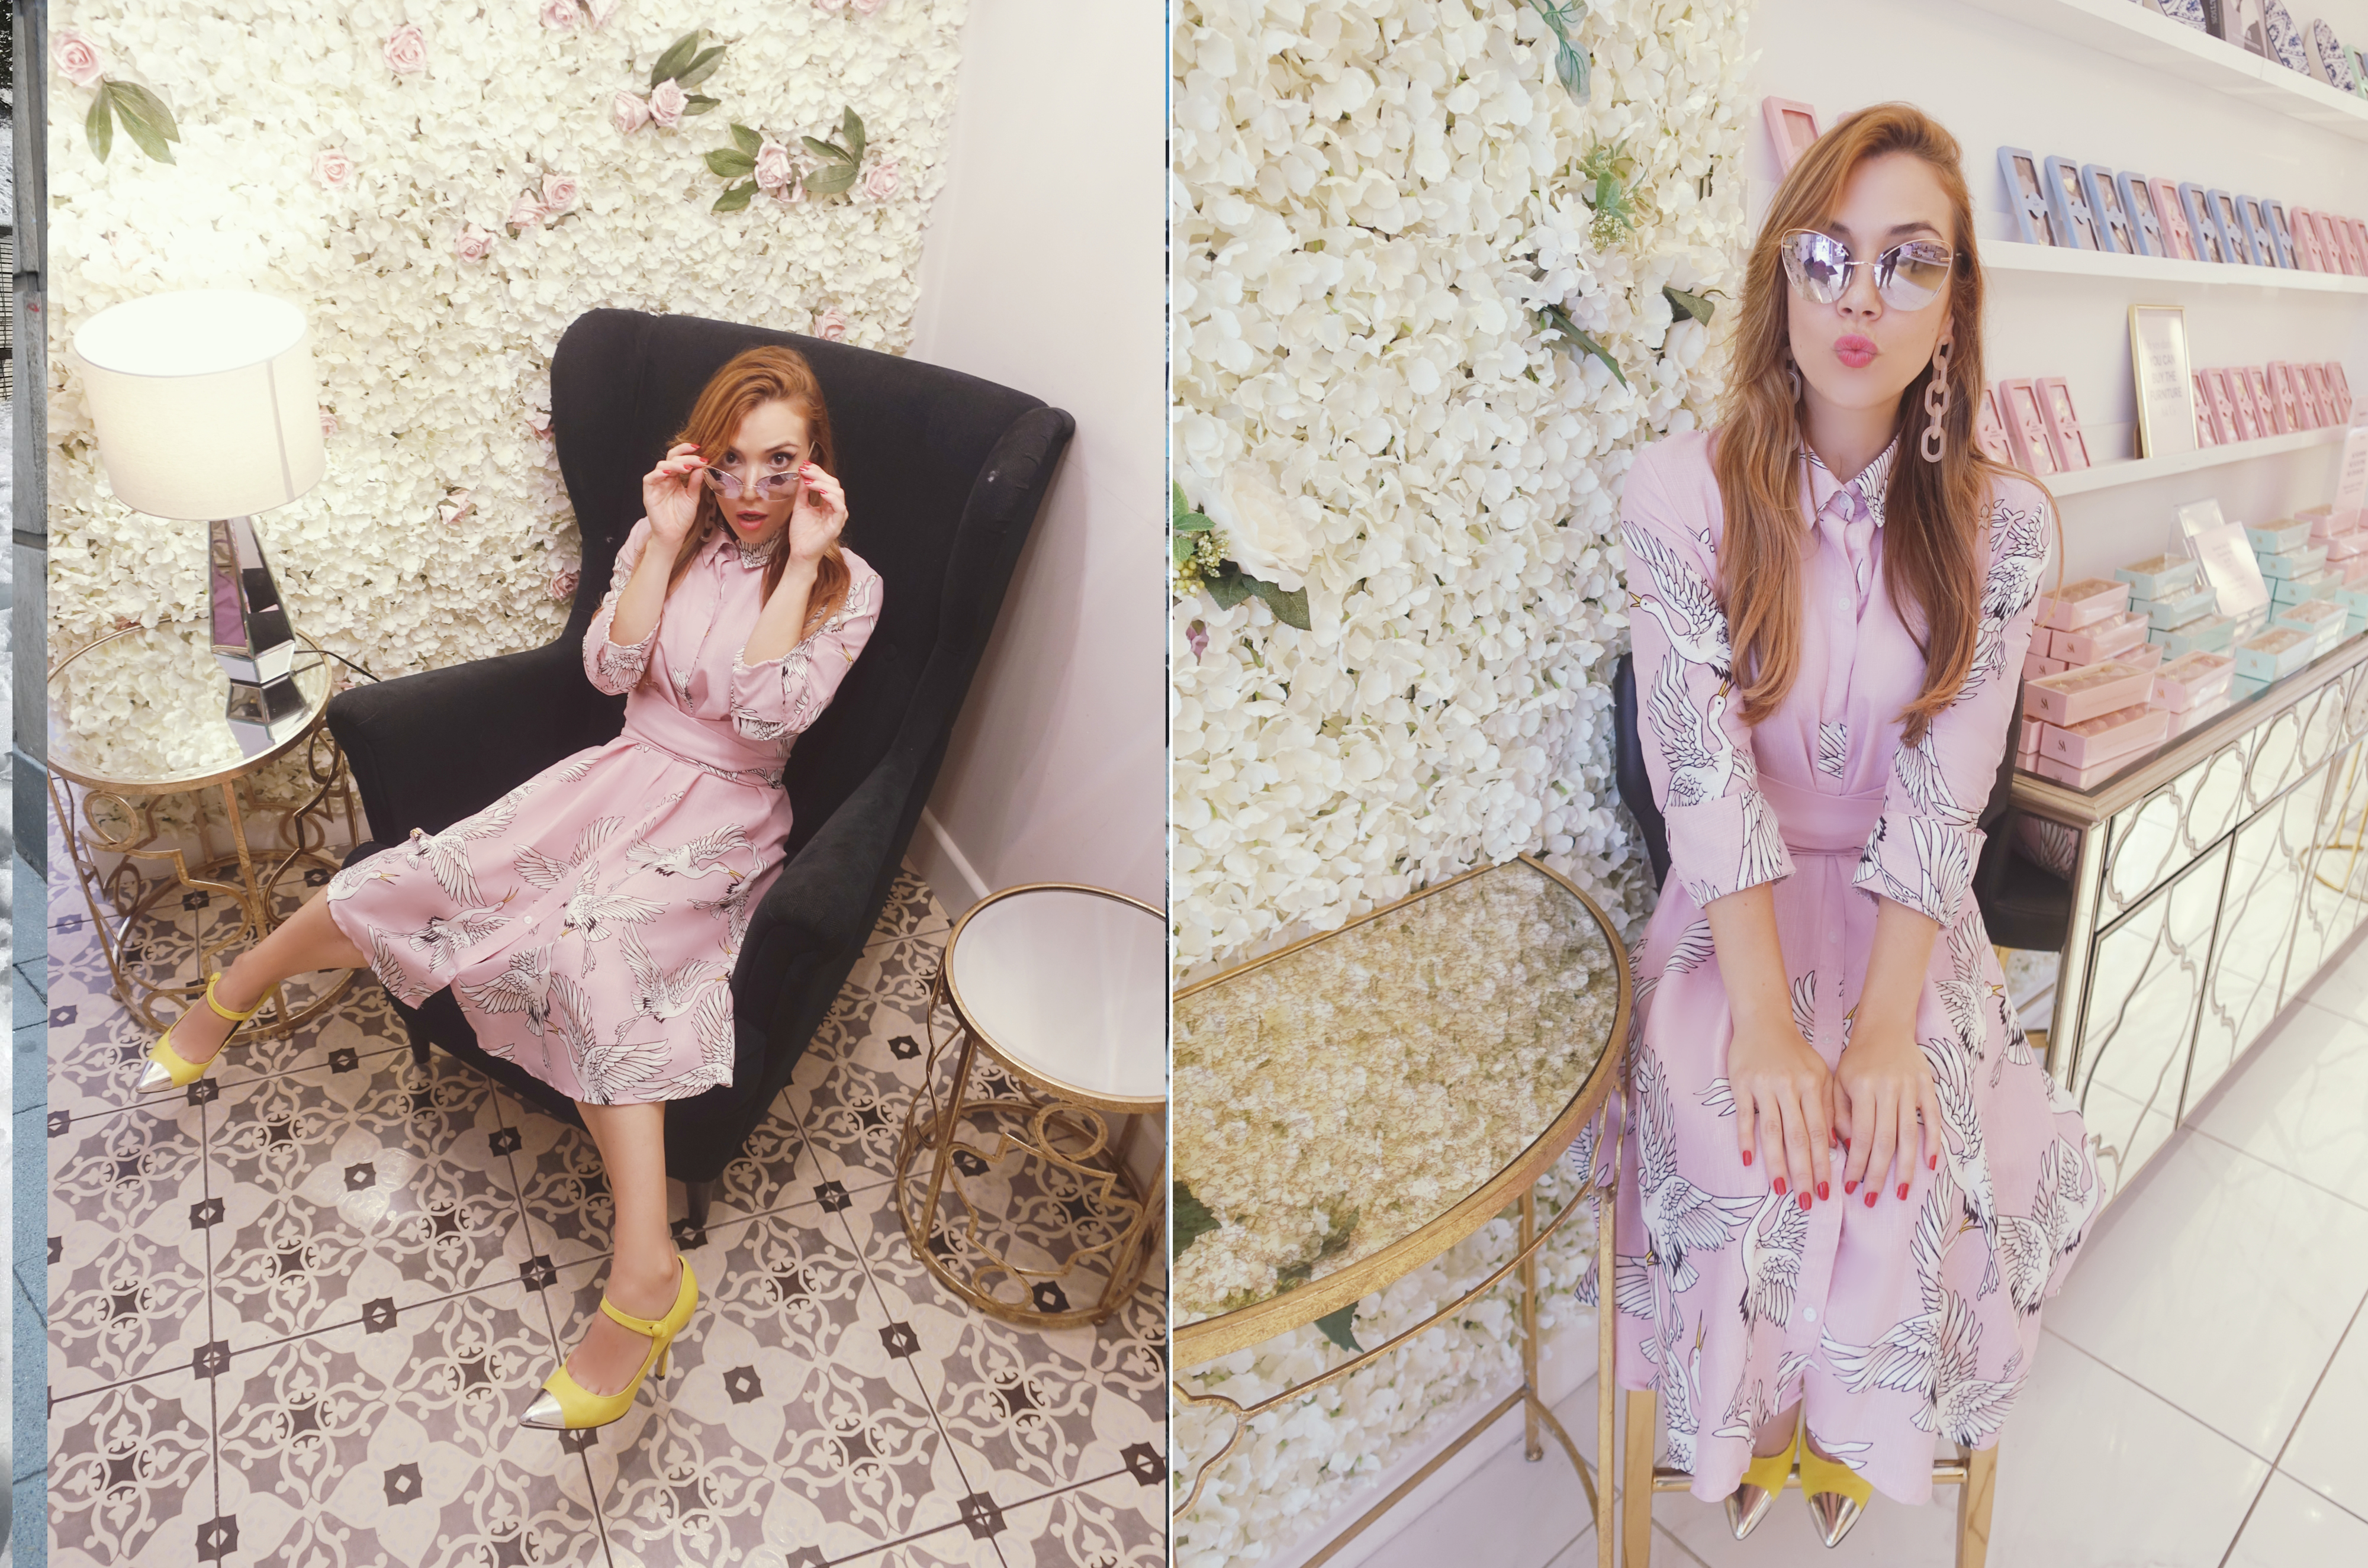 PiensaenChic-blog-de-moda-Chicadicta-london-cafe-saint-aymes-fancy-dress-smile-look-rosa-Piensa-en-Chic-romantic-outfit-Chic-adicta-traveller